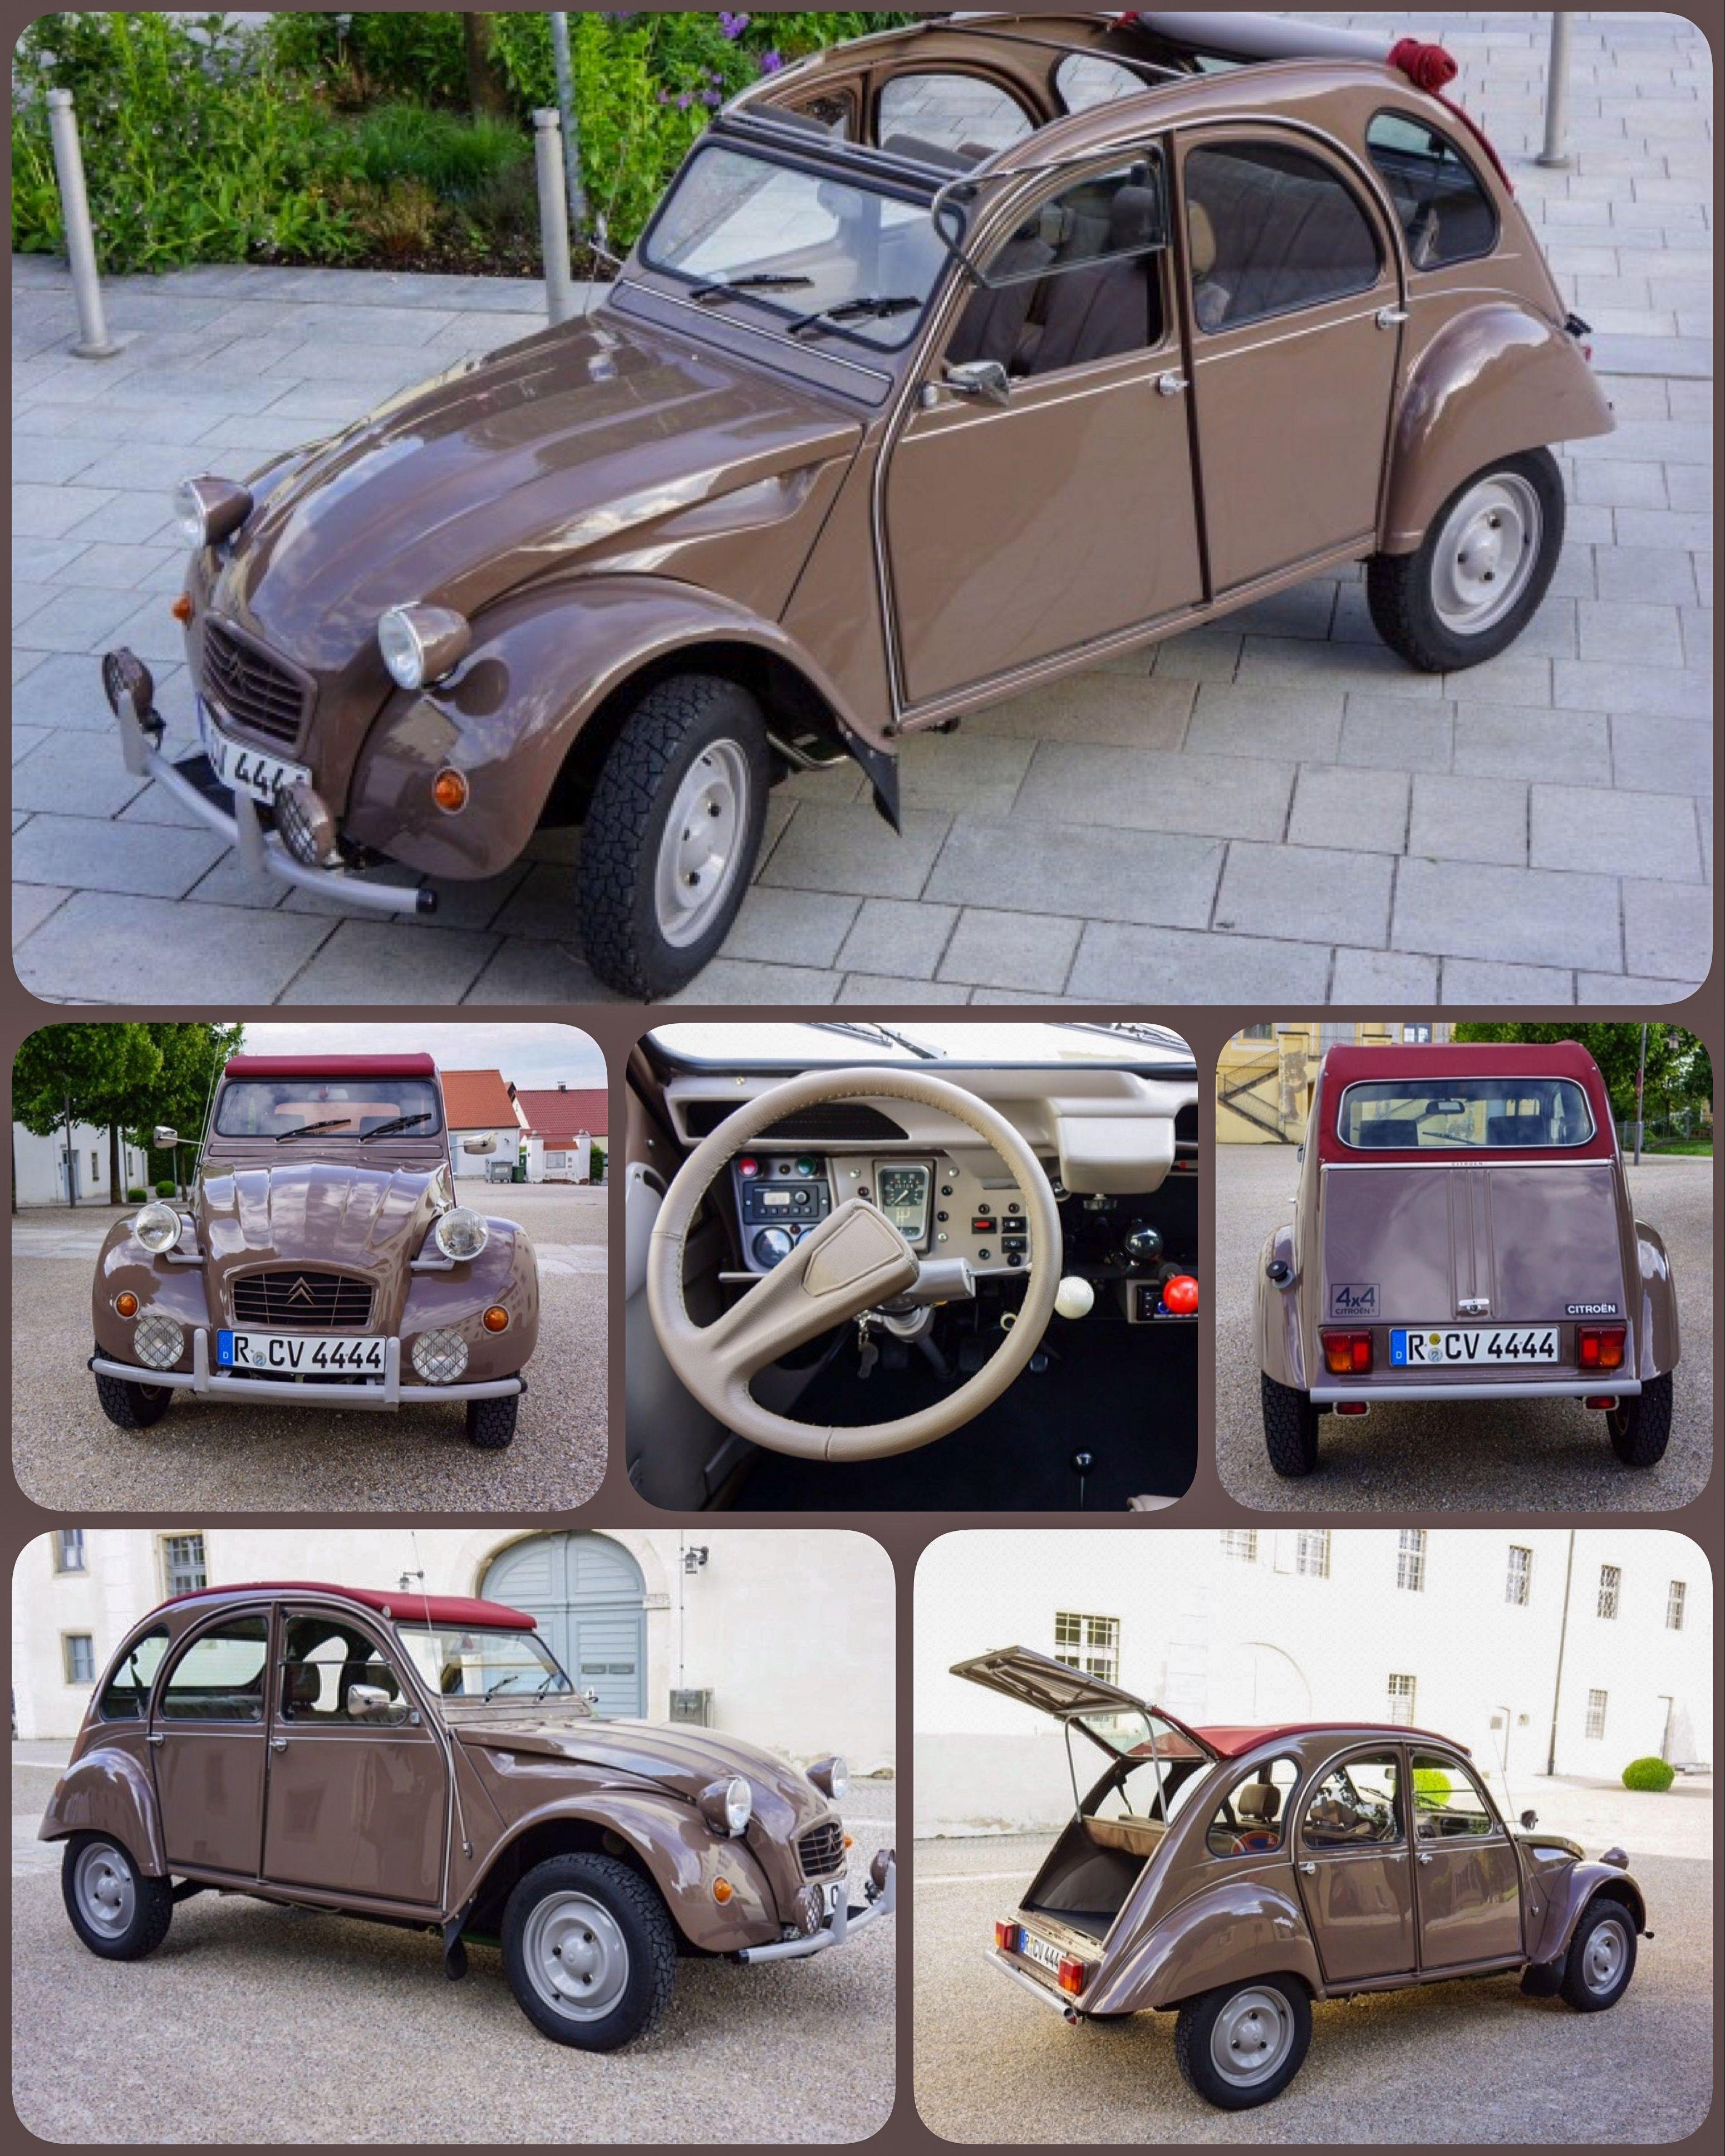 Citroen 2cv Legendary French Classic Car In 2020 Exotische Autos Alte Autos Oldtimer Autos